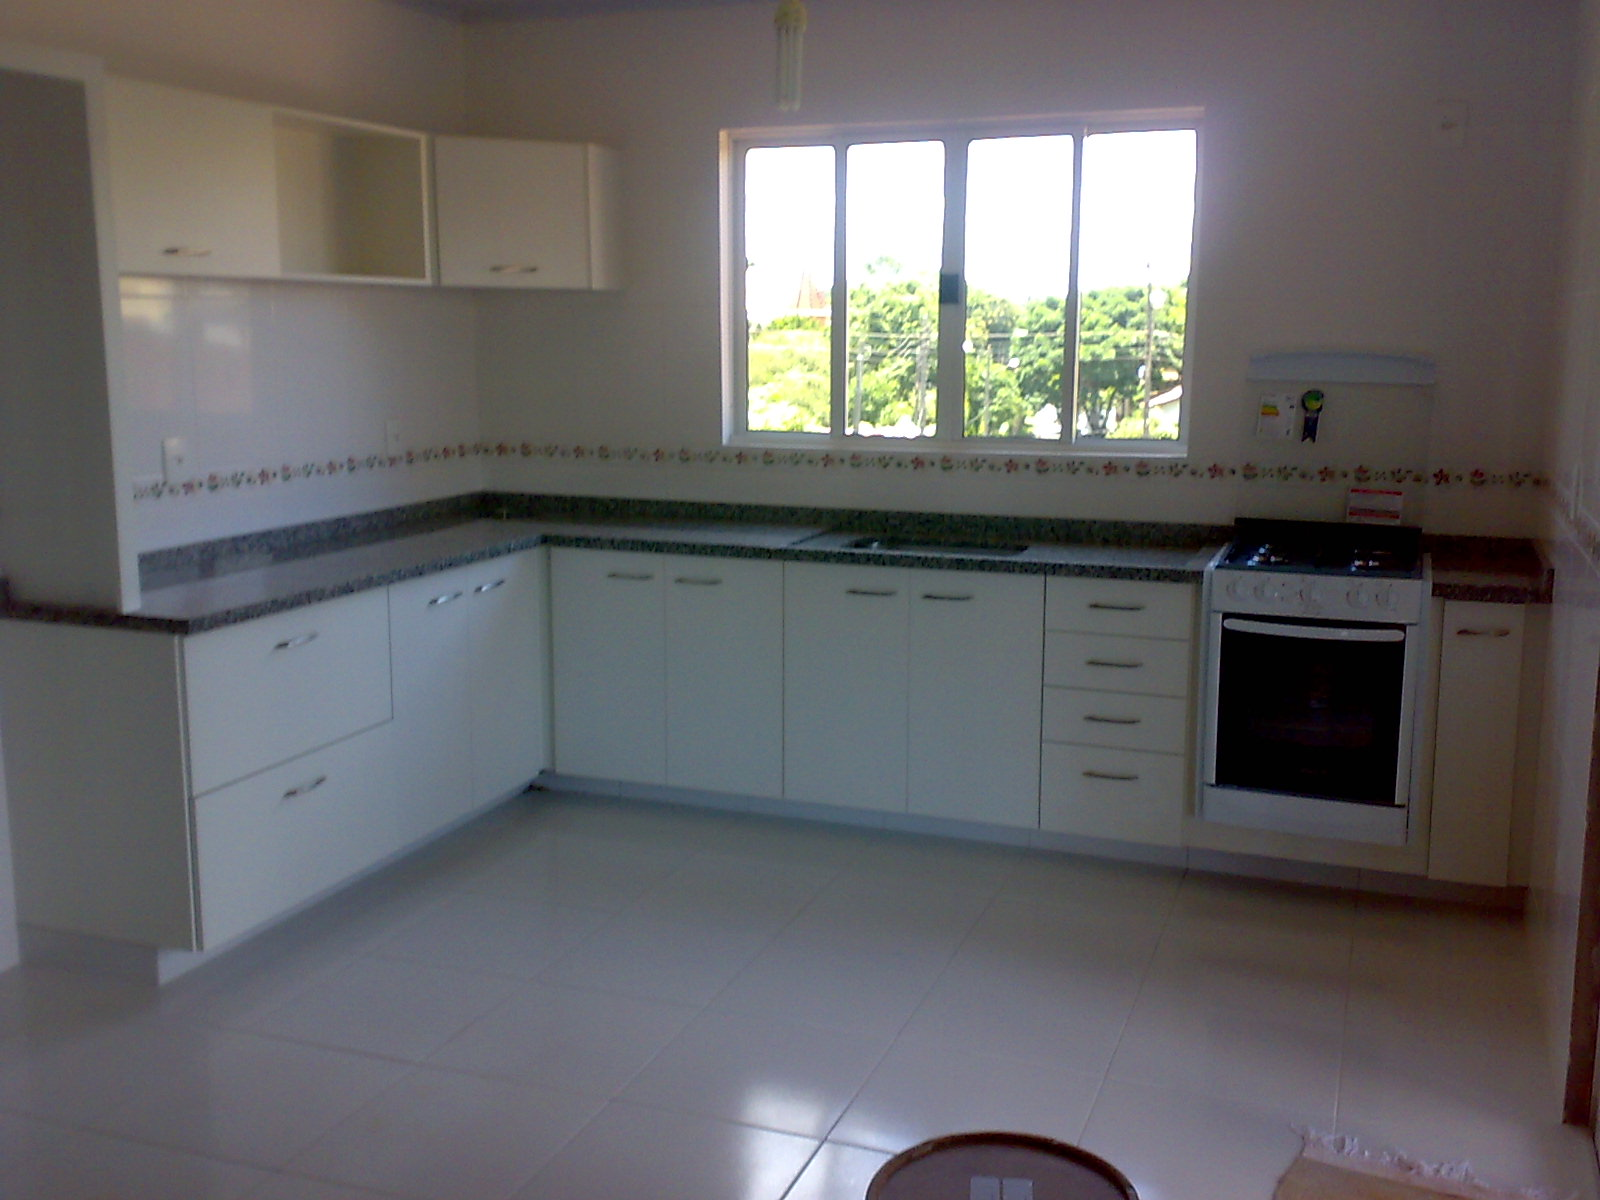 Móveis Sob Medida Jair F. Stocco: Cozinhas #809833 1600 1200